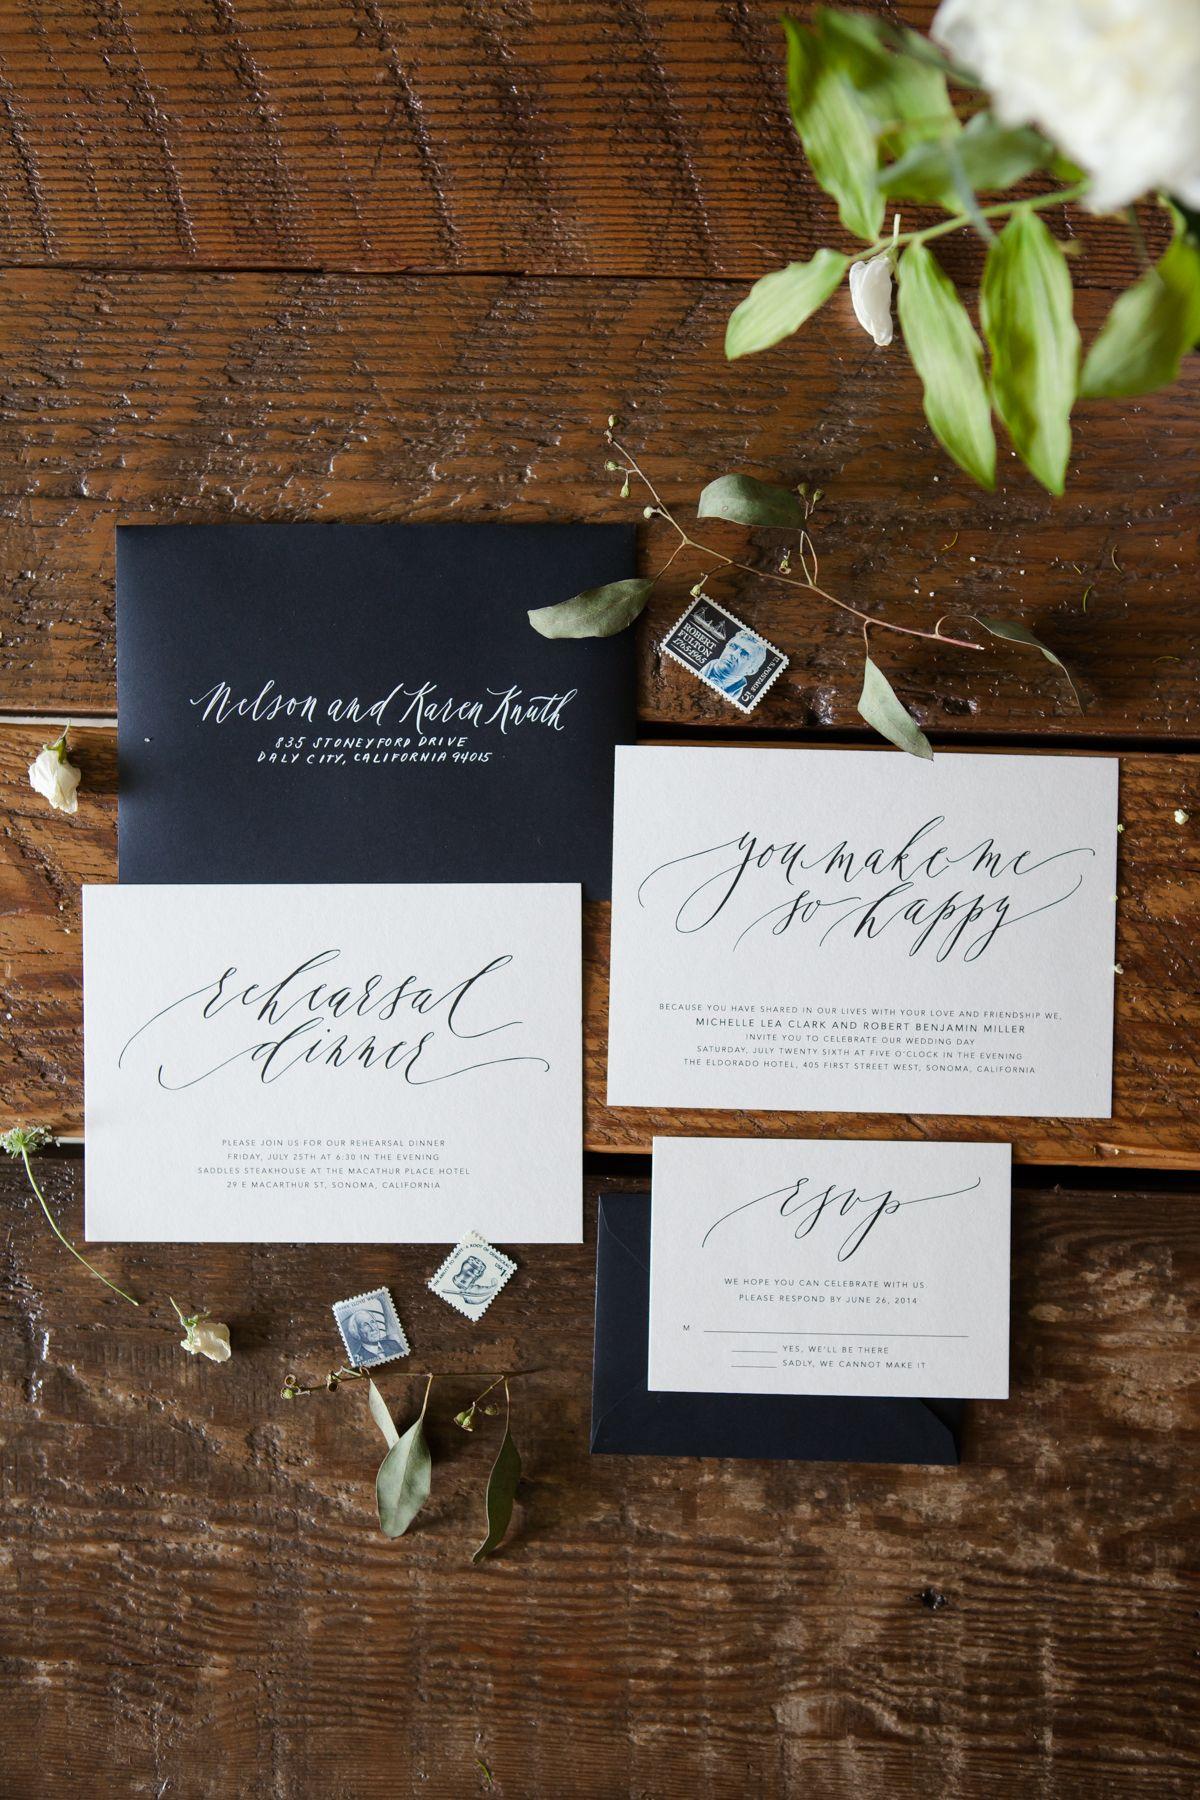 Monochromatic calligraphy wedding invitations written